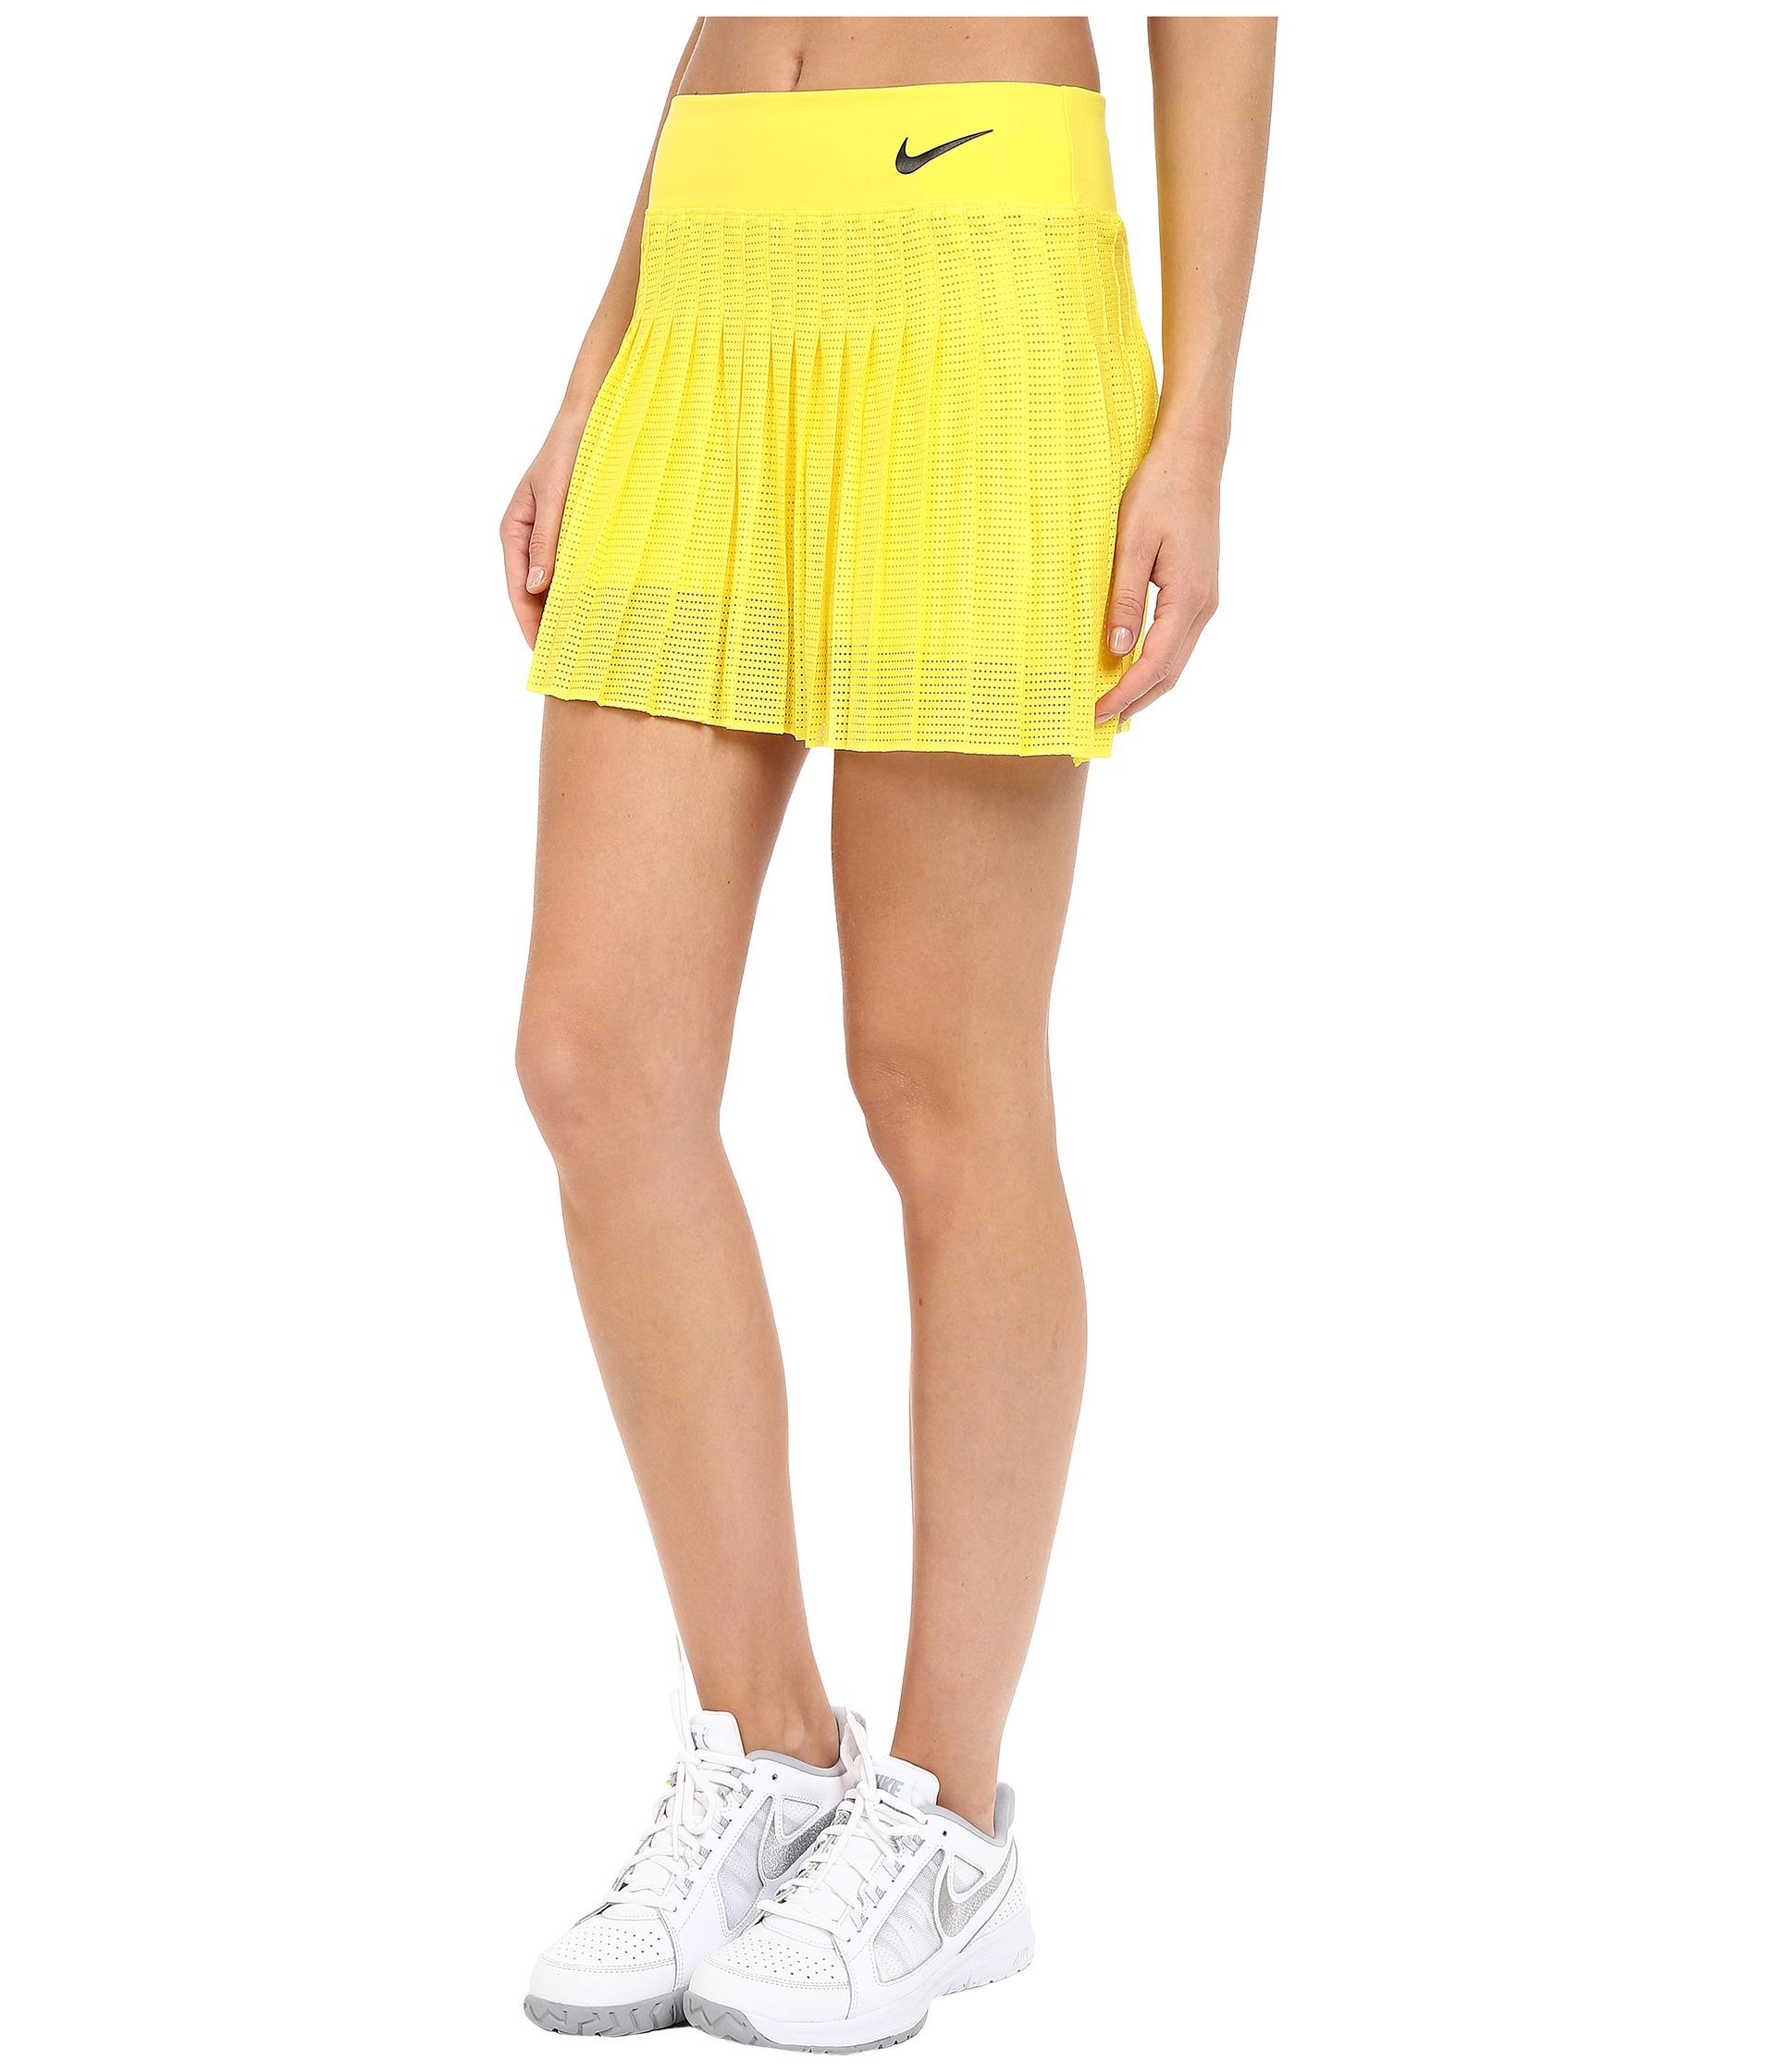 roshe run blanc homme - Nike, Skirts at 6pm.com